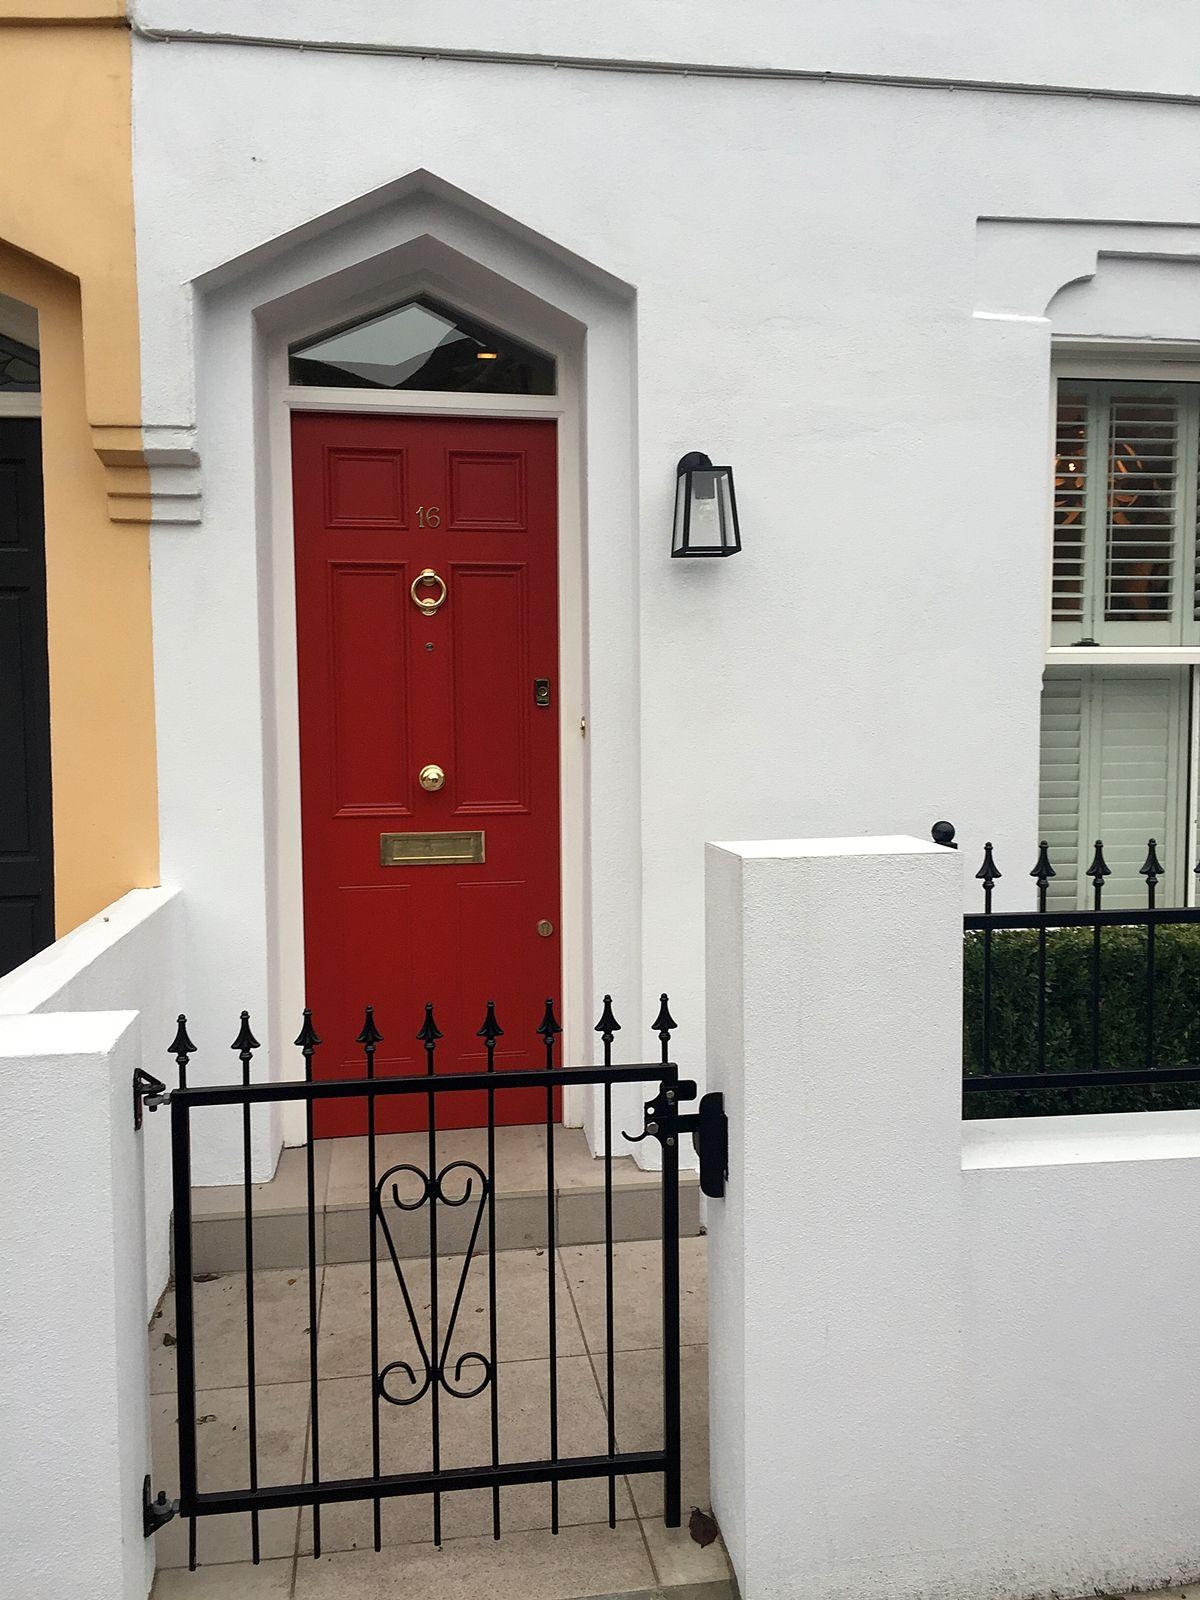 Unique Main Entrance Gate Design For Home Picture Collection - Home ...